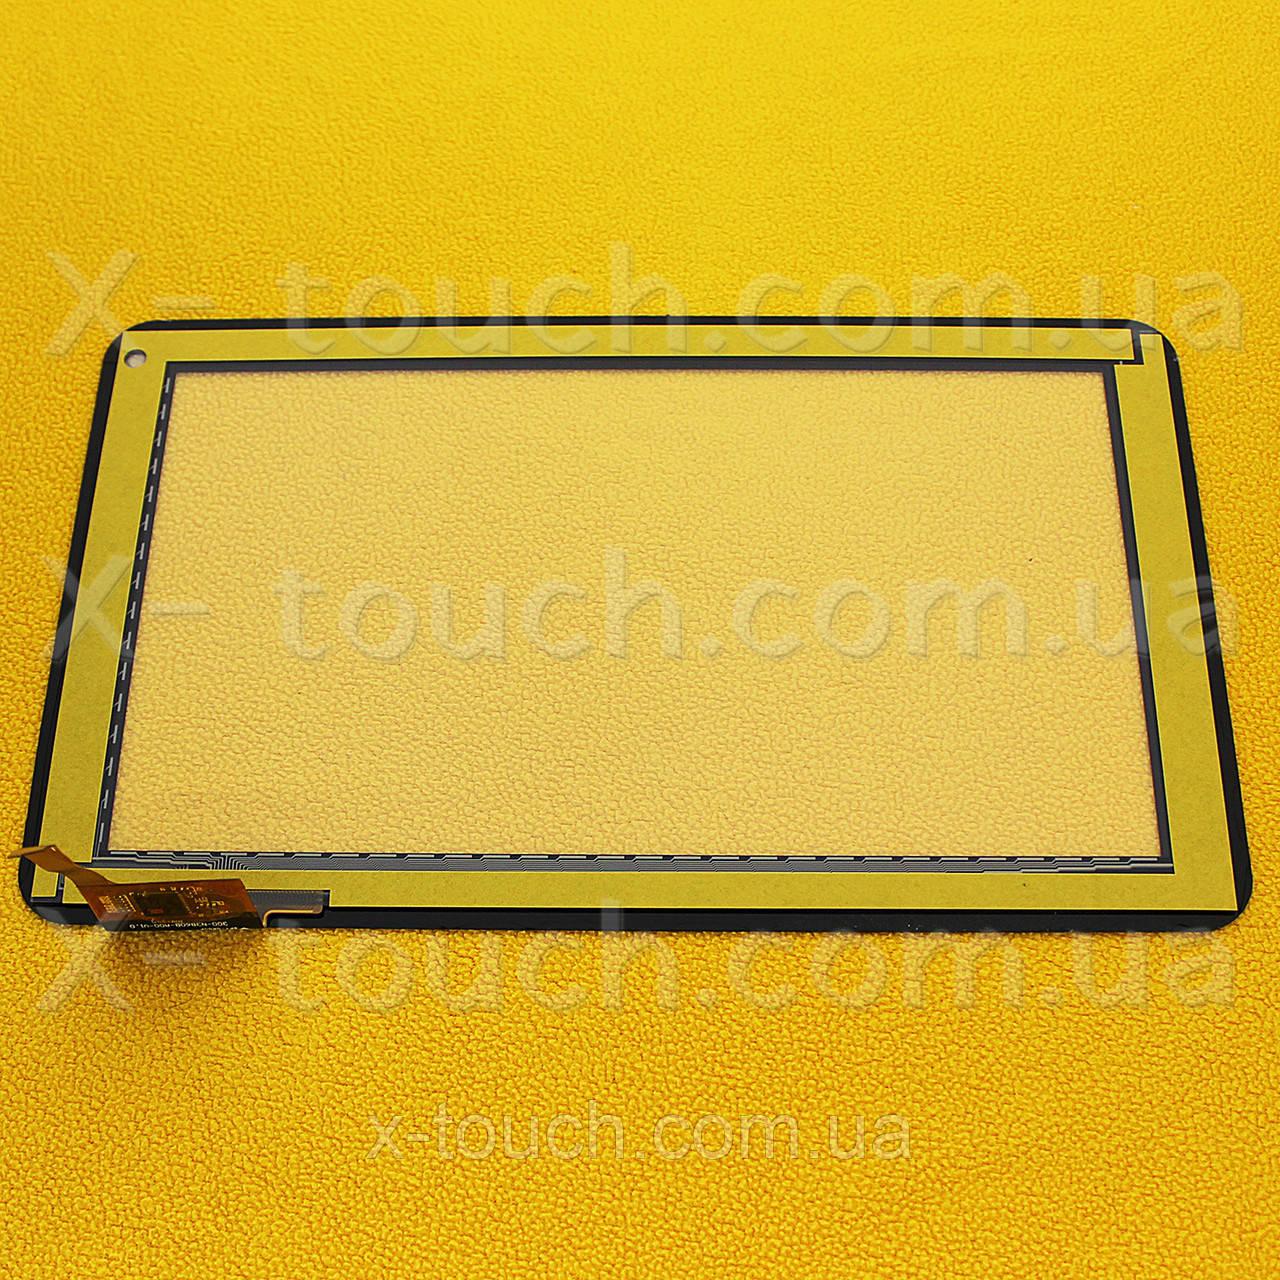 Тачскрин, сенсор  FPC-TP090001(M906)-00  для планшета